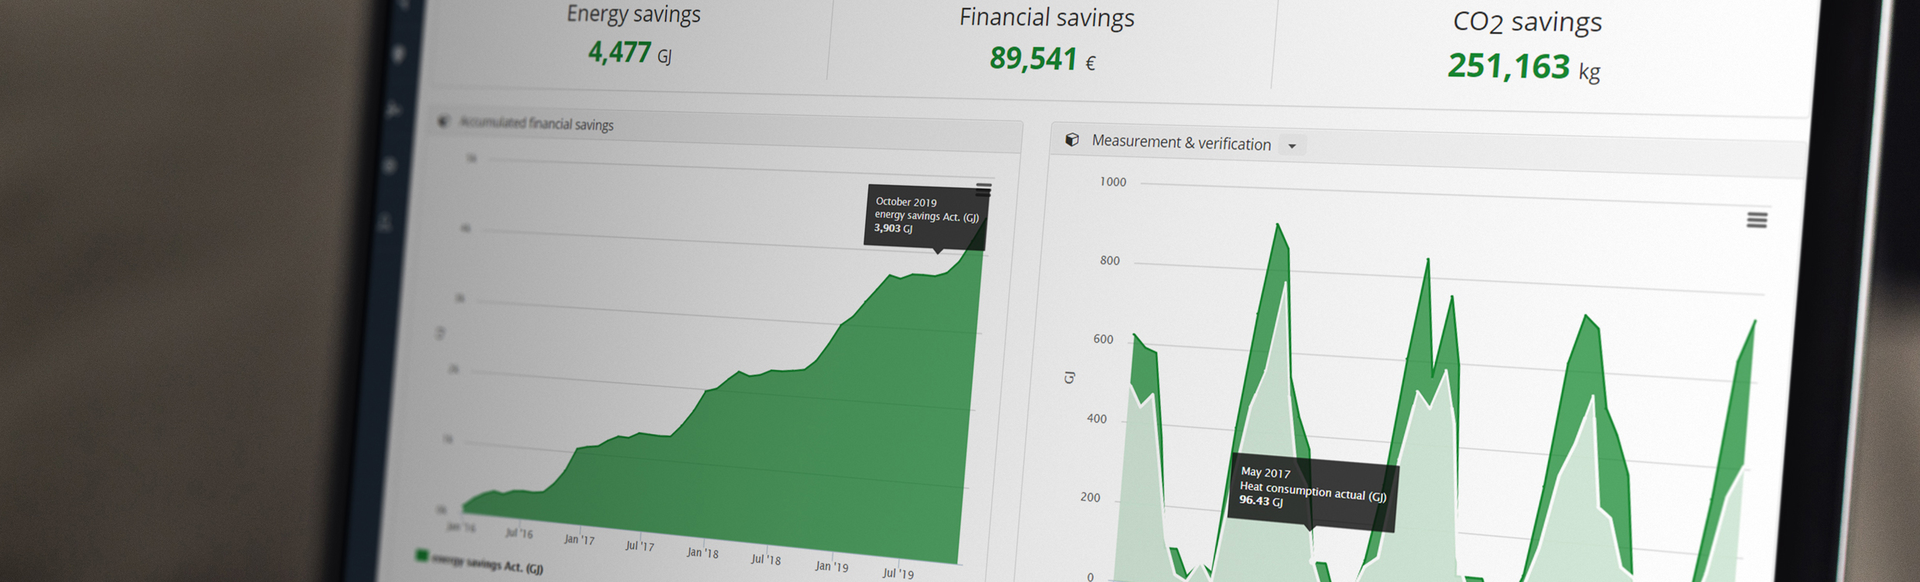 Savings-dashboard